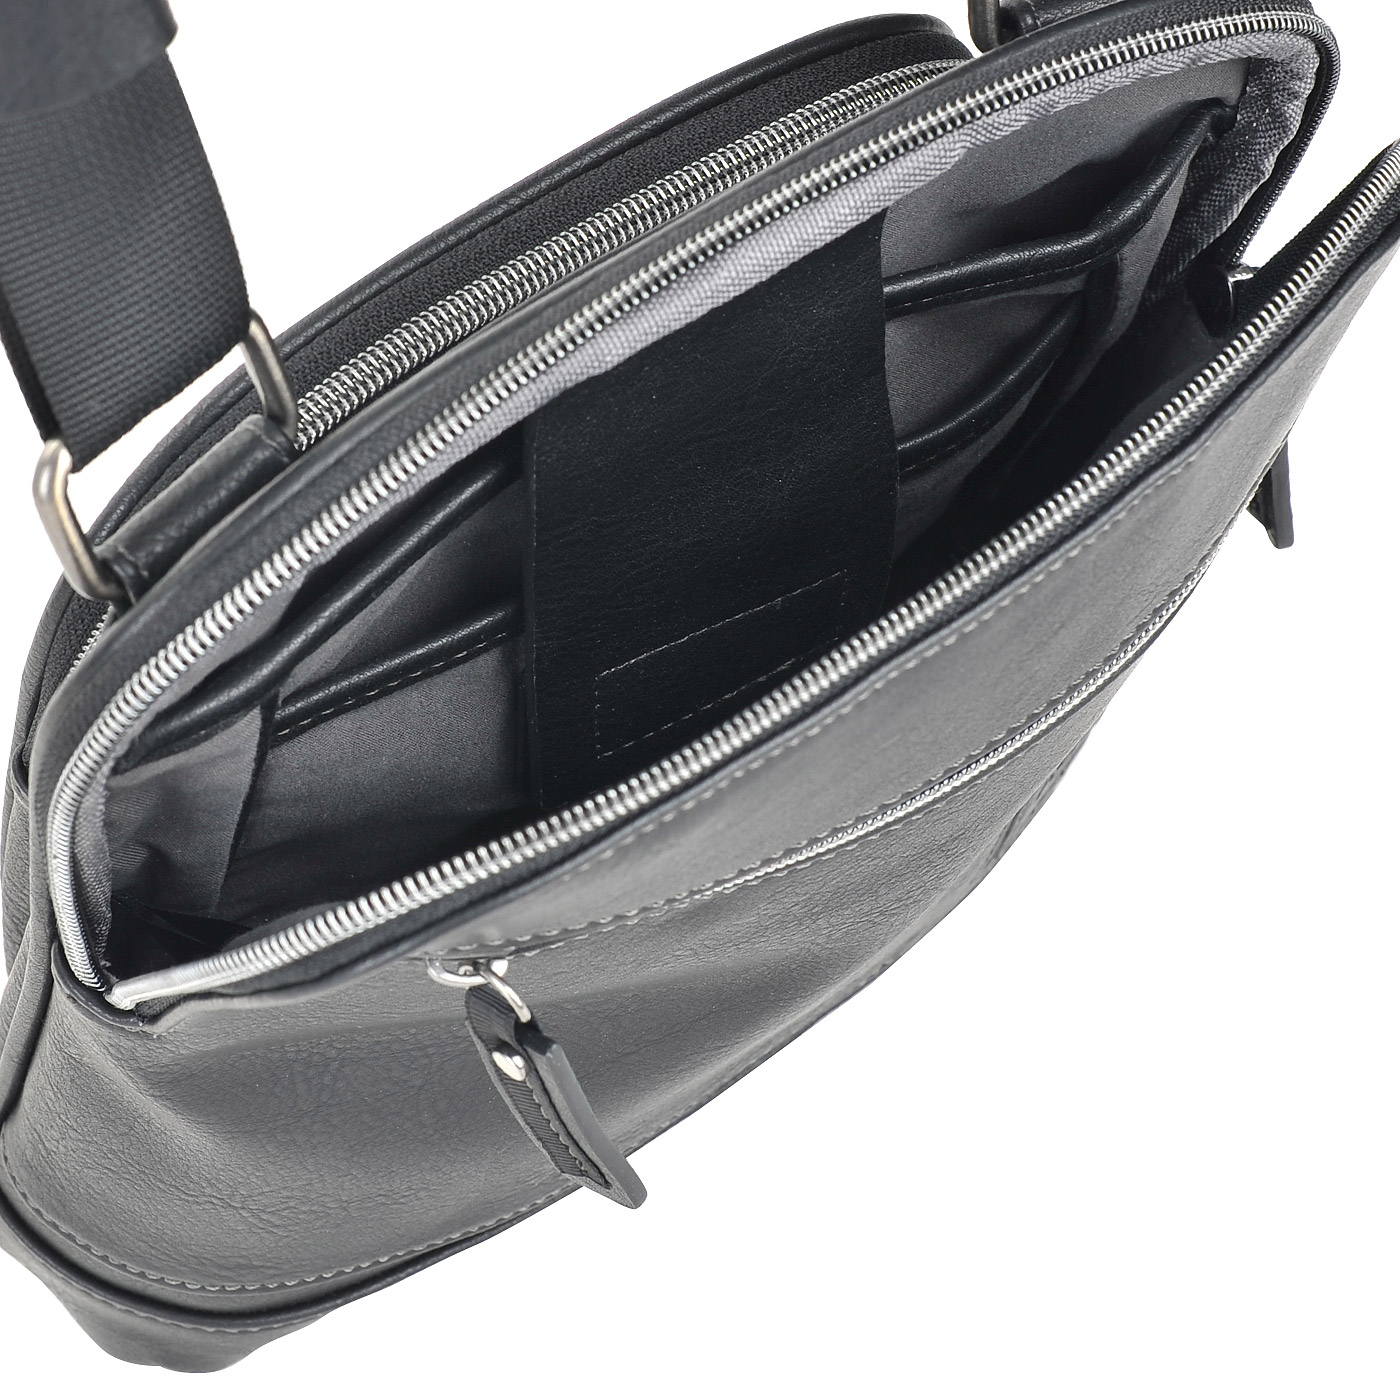 6c8042843fe7 Мужская сумка через плечо Picard Breakers 2465 1U5_schwarz ...